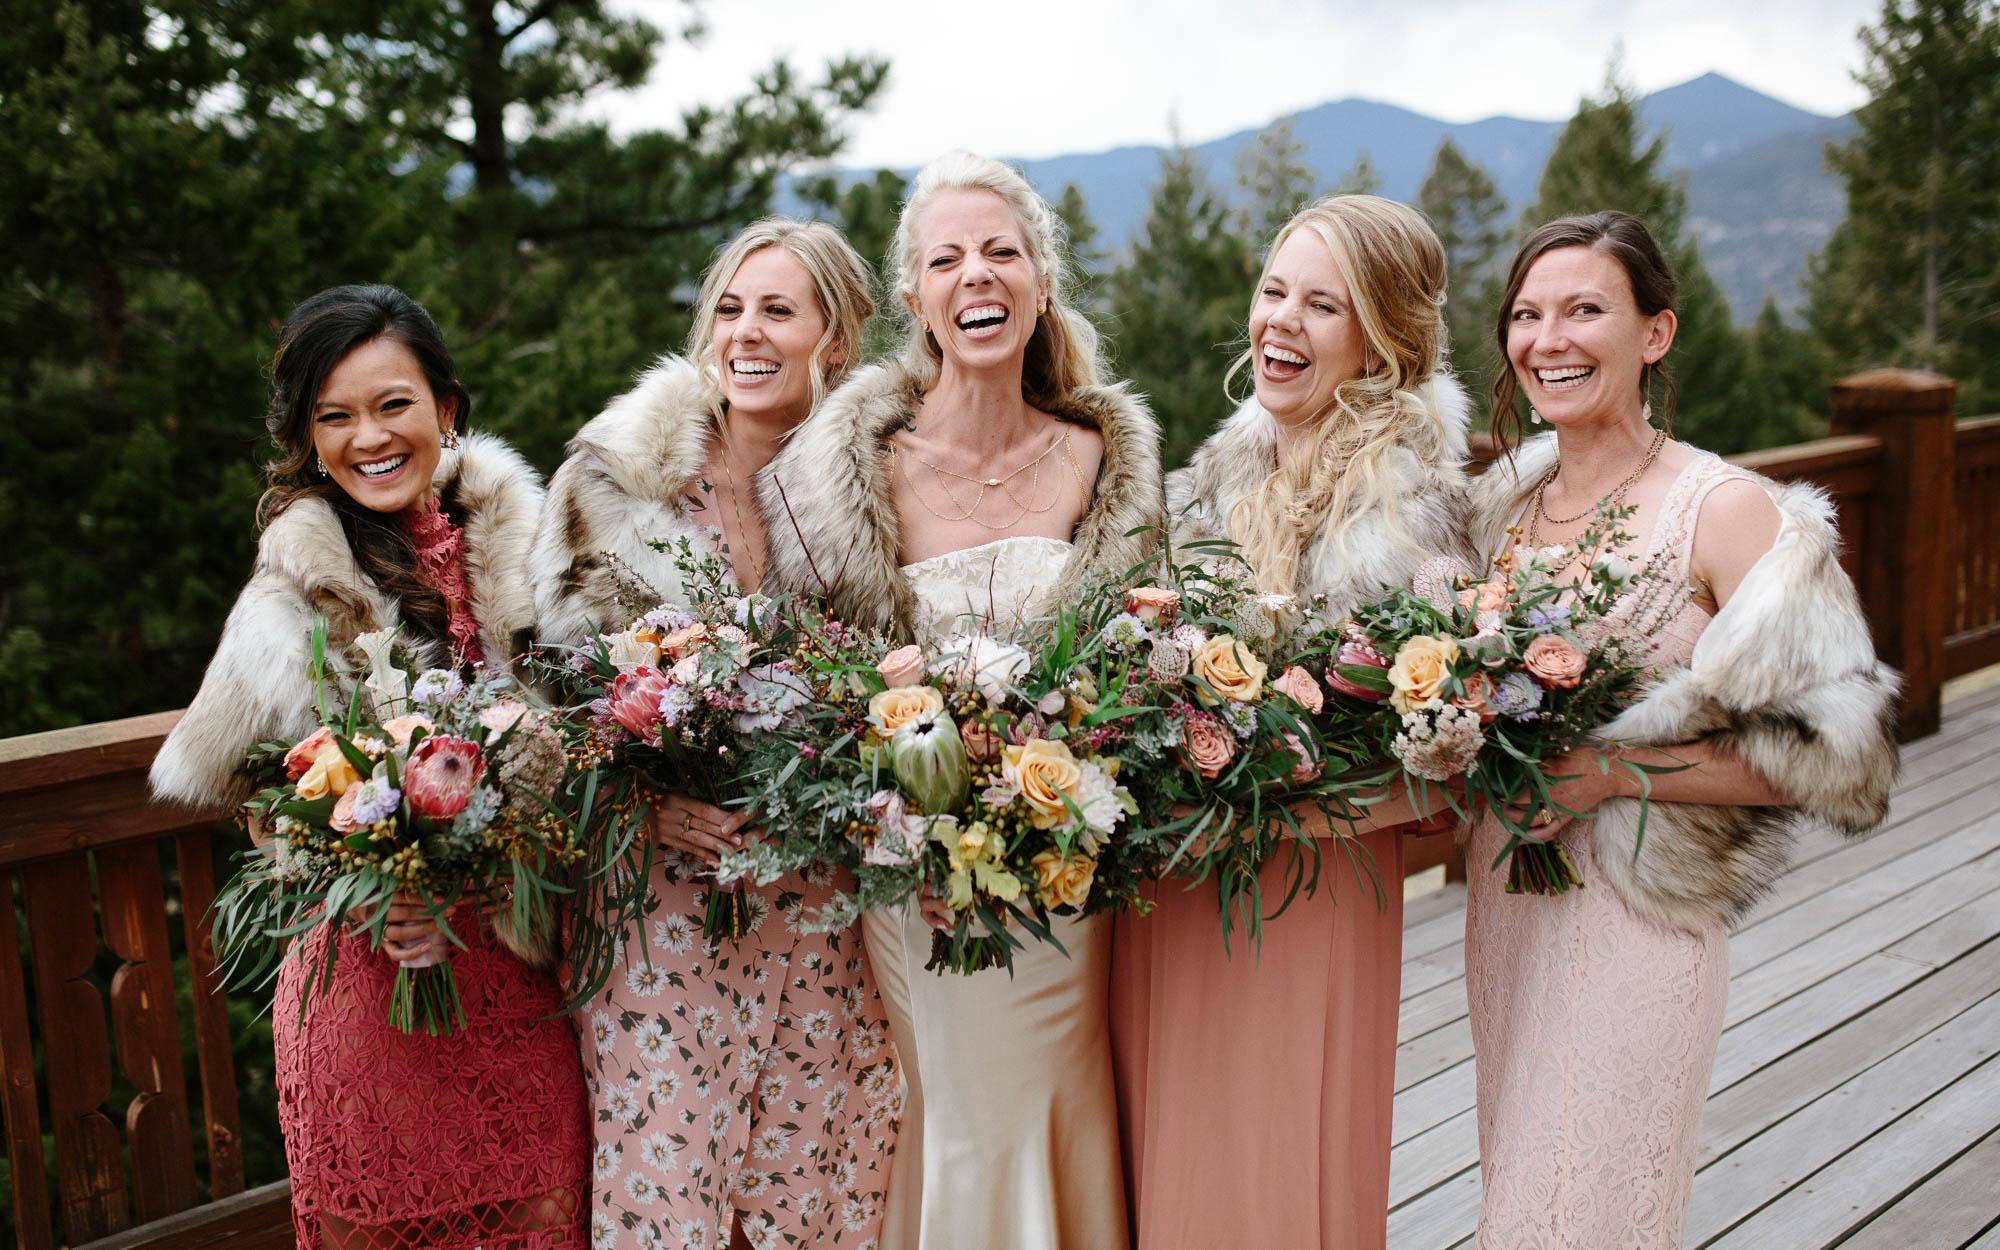 bucci-barn-wedding-elopement-evergreen-boulder-denver-colorado-adventerous-romantic-timeless-045.jpg